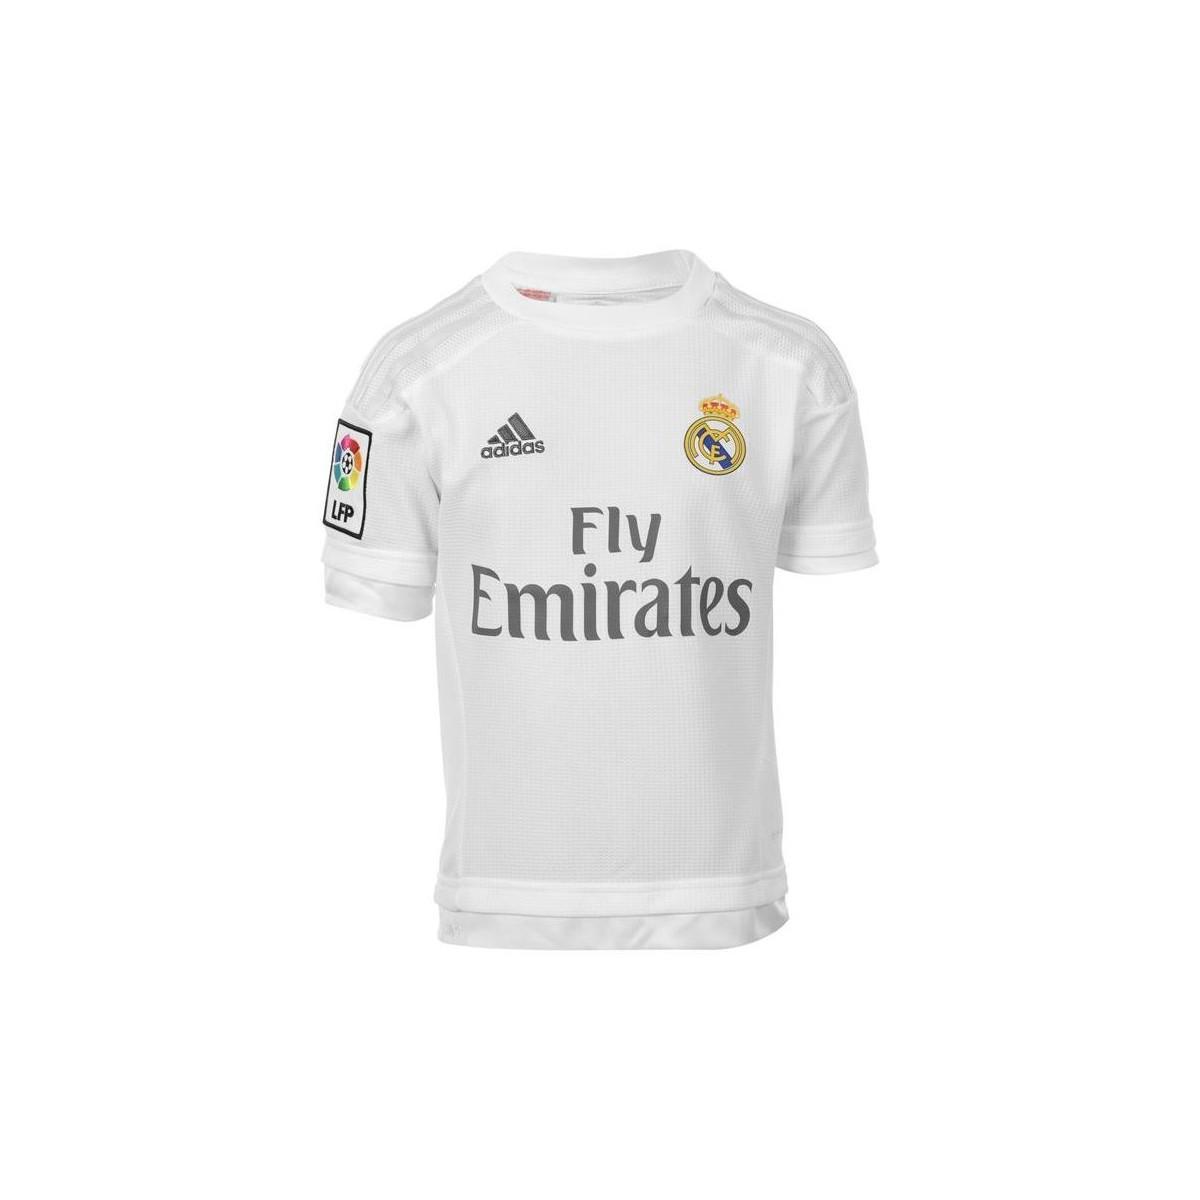 9d669c05474 Adidas - 2015-16 Real Madrid Home Shirt (ronaldo 7) - Kids Women s. View  fullscreen